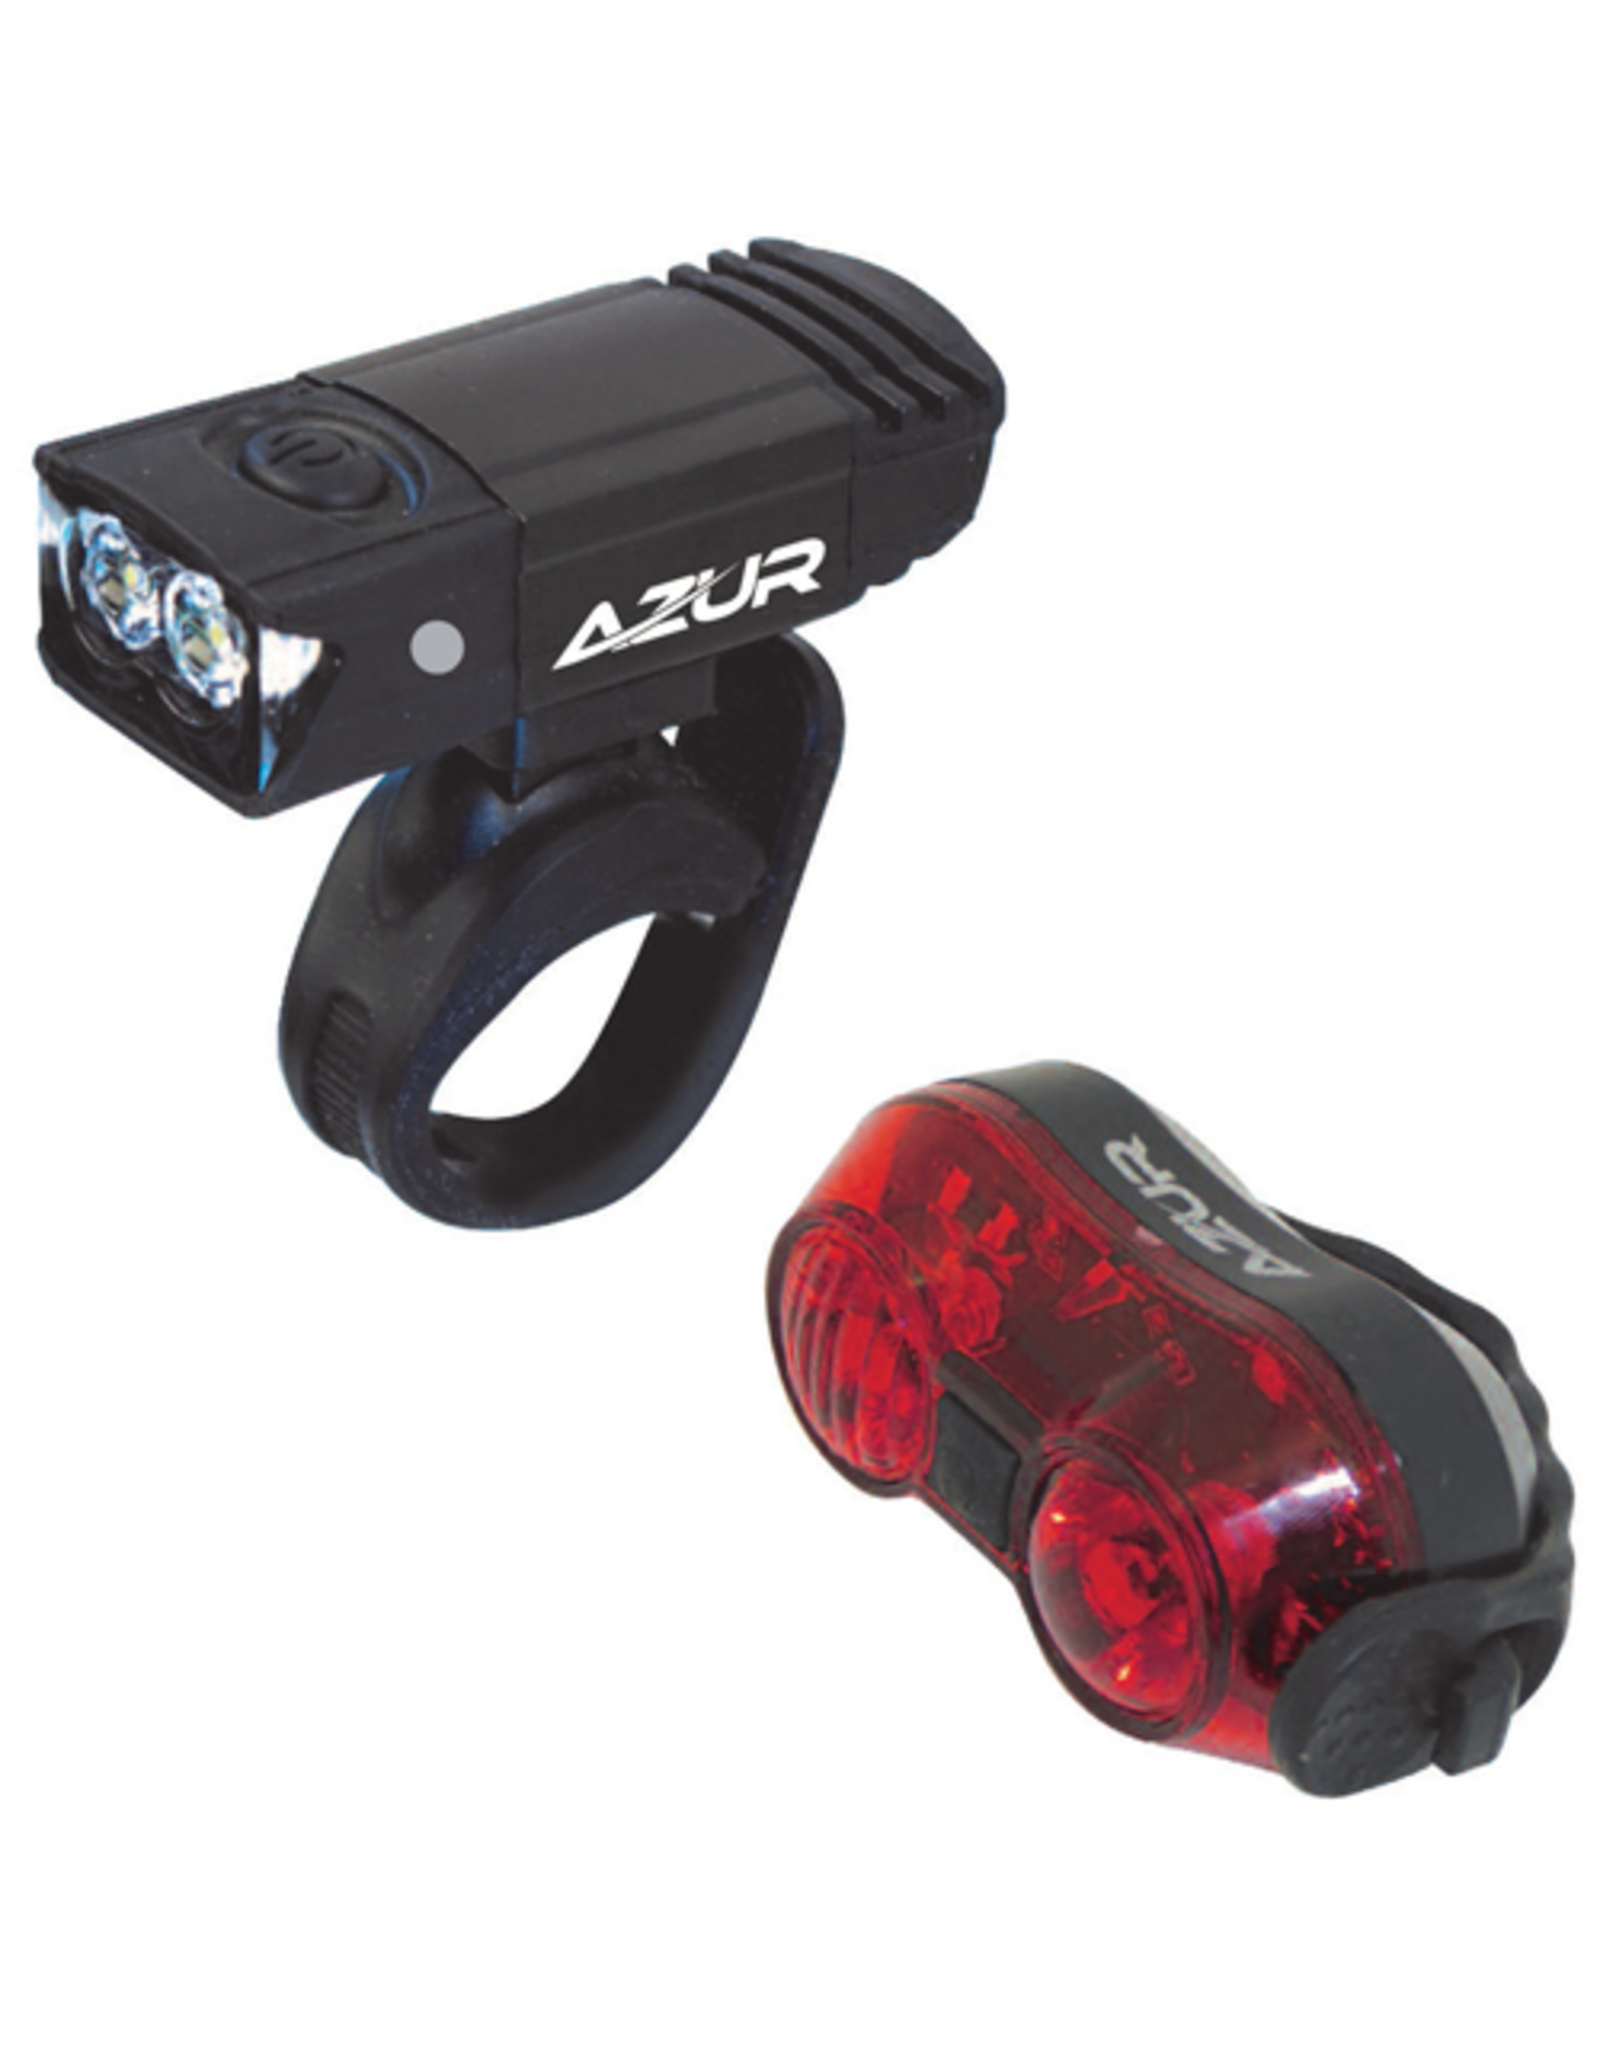 AZUR AZUR 65/30 LIGHT SET 65 LUMEN HEAD LIGHT 30 LUMEN TAIL LIGHT USB RECHARGEABLE